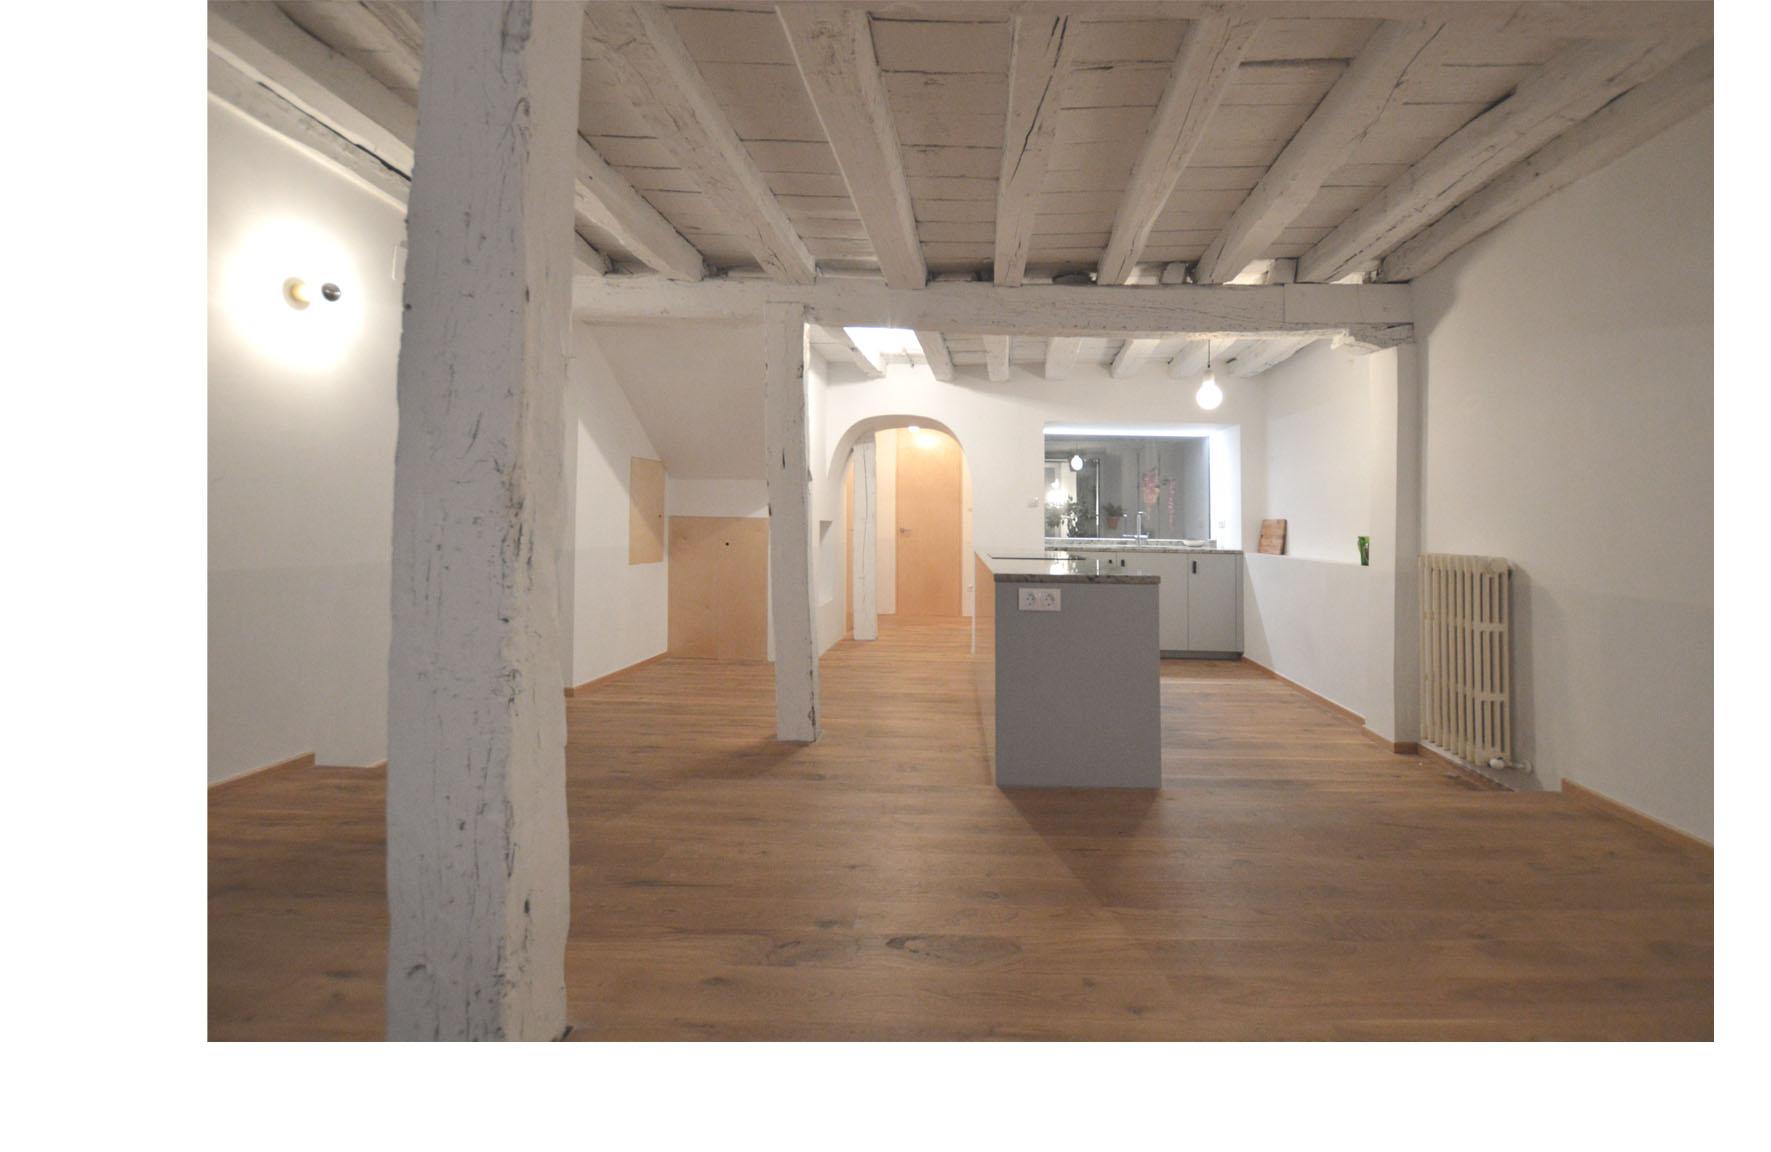 Apartment Artekale-Bilbao-Image 02.jpg